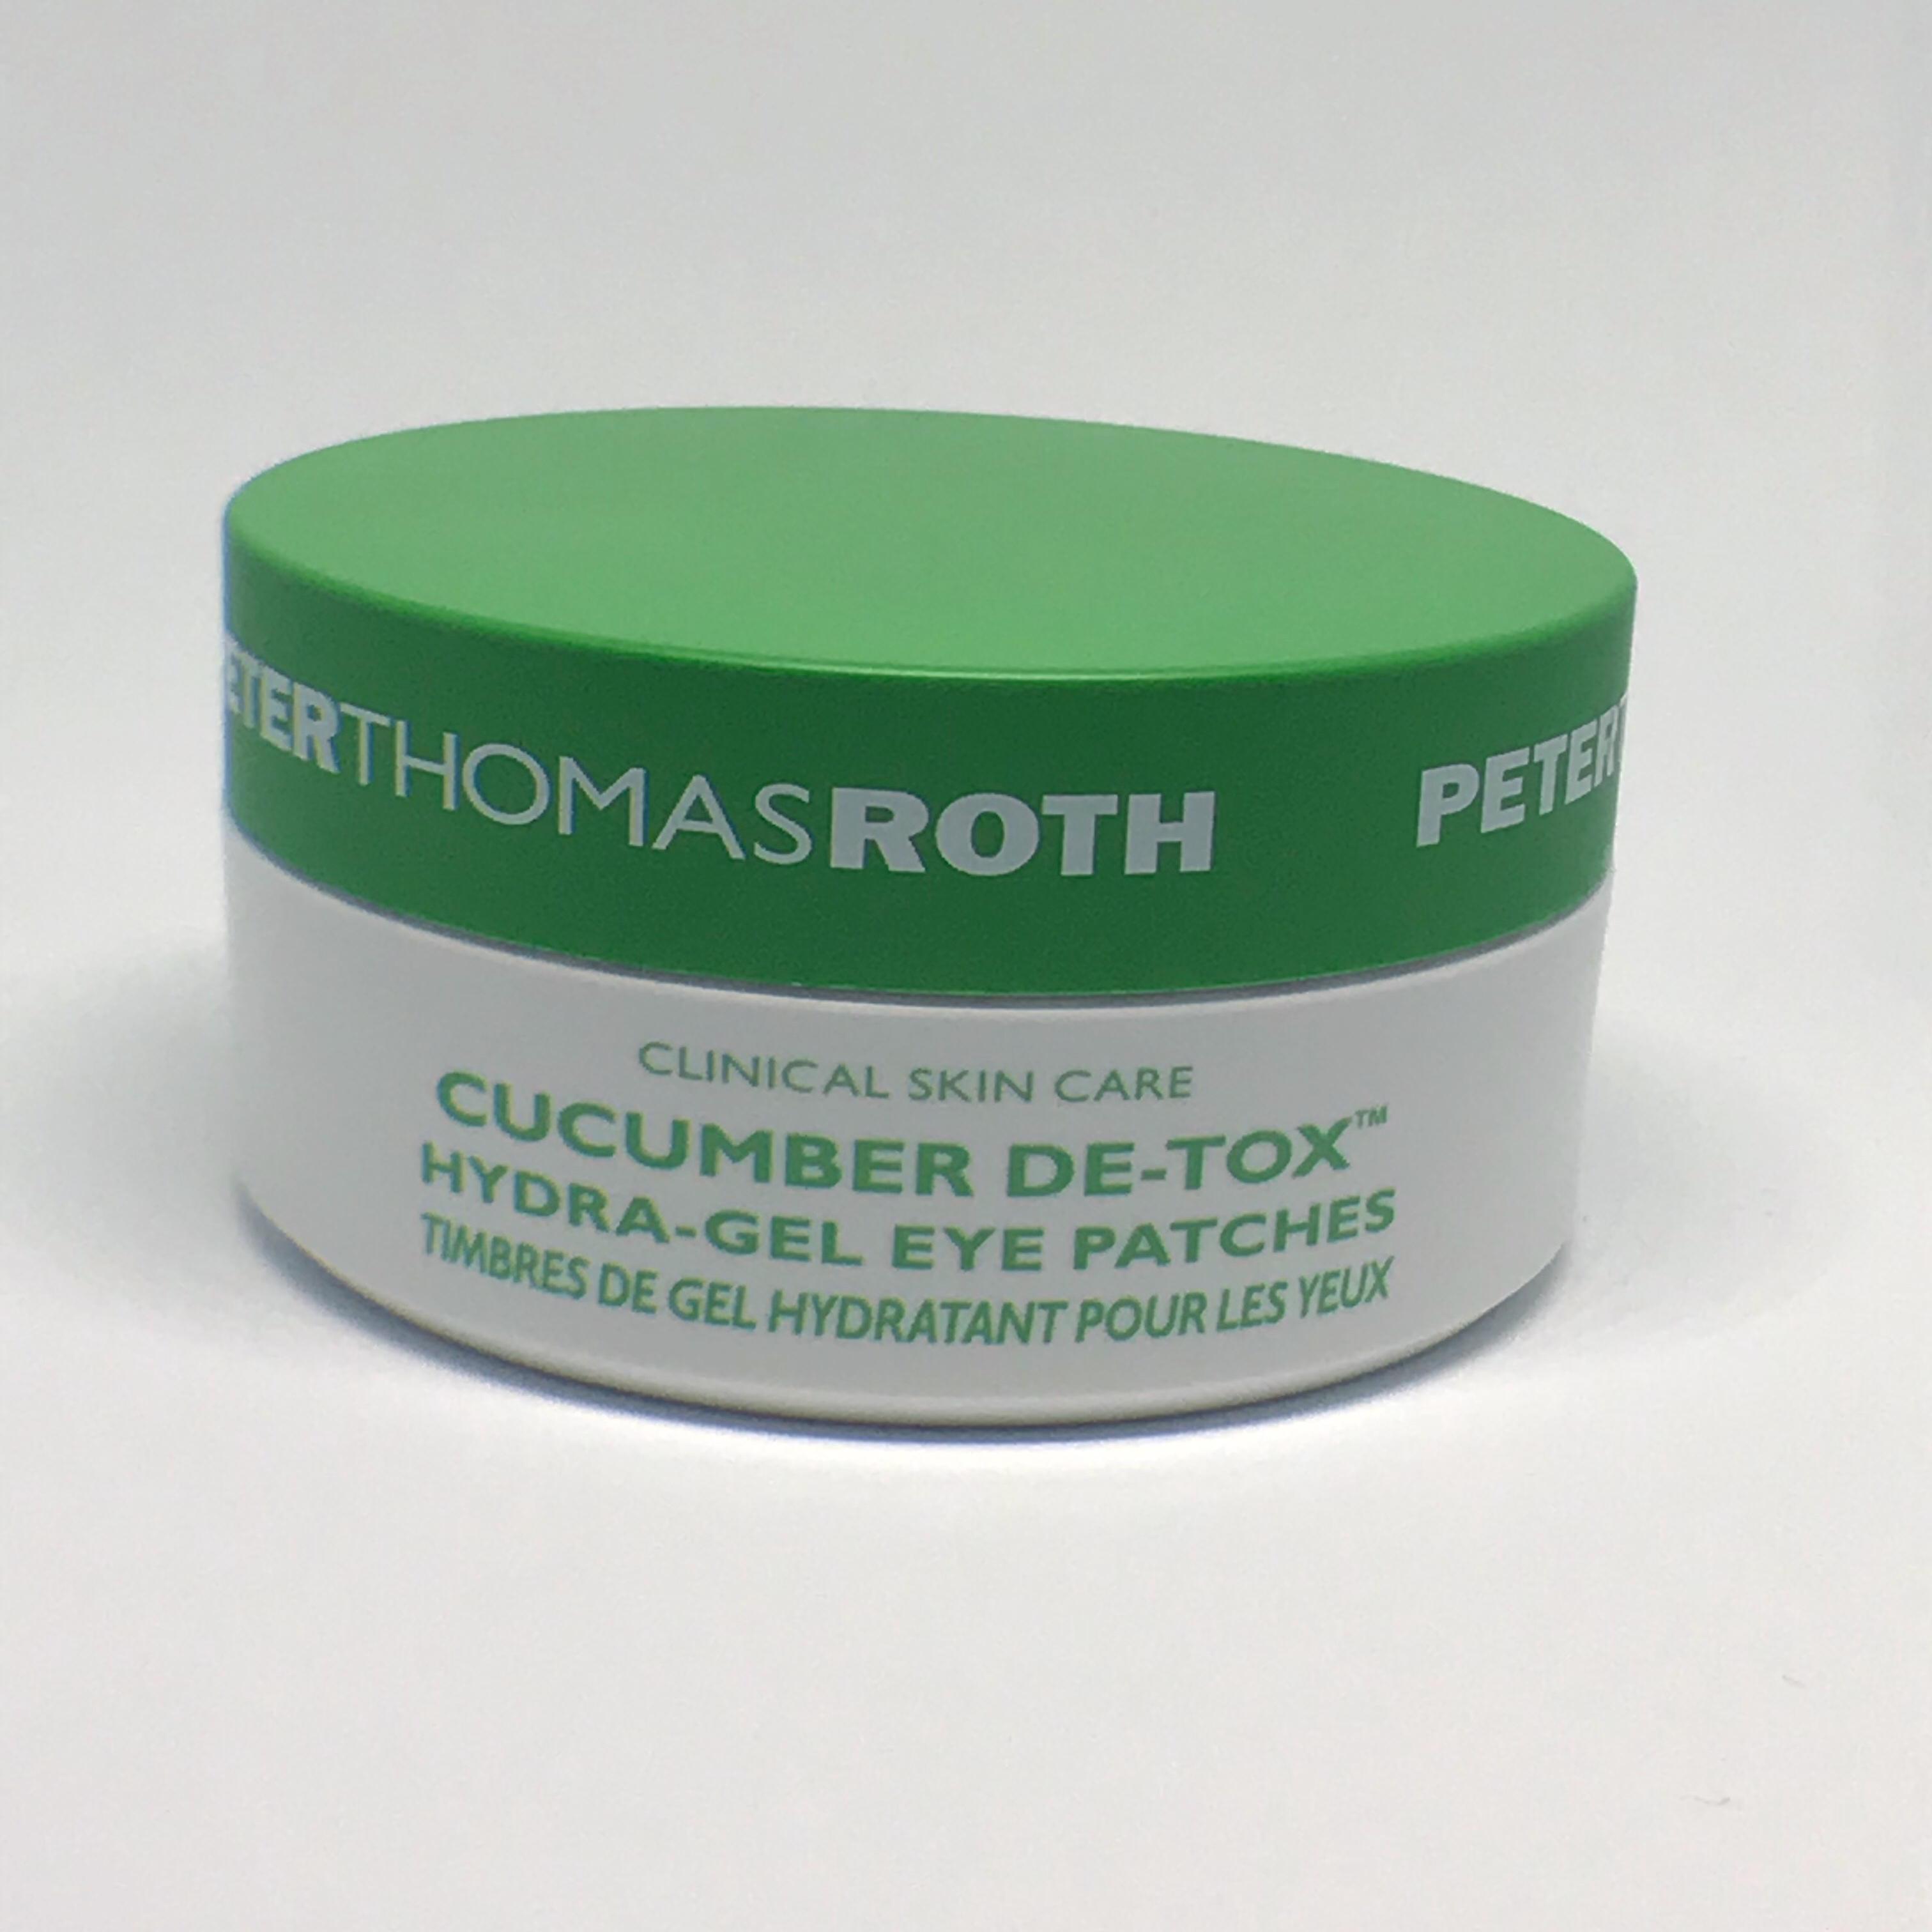 Peter Thomas Roth Cucumber De-Tox Hydra-Gel Eye Gels